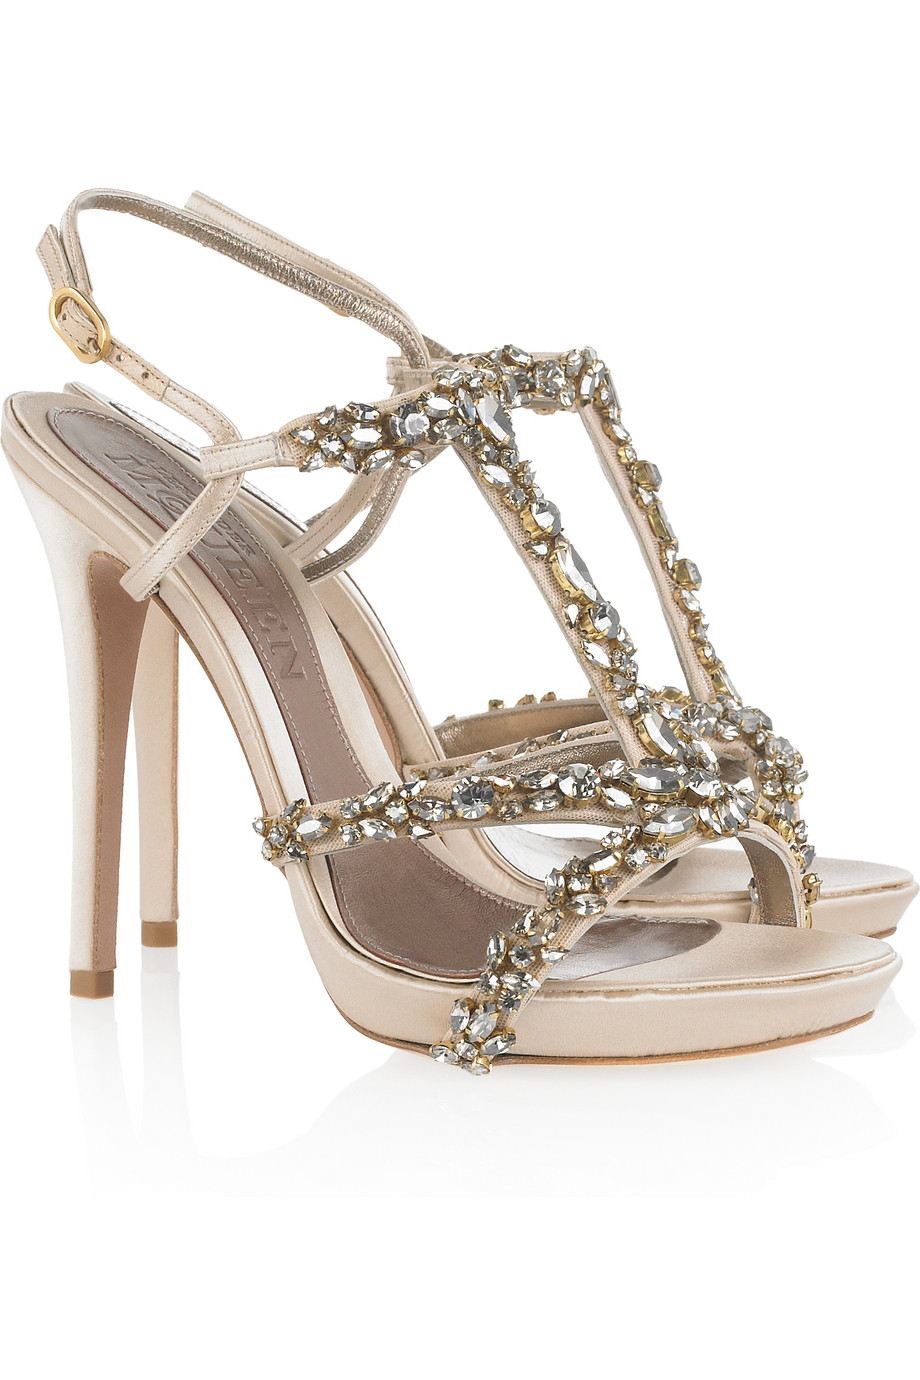 Alexander McQueen Crystal-embellished satin sandals PV2qsPu